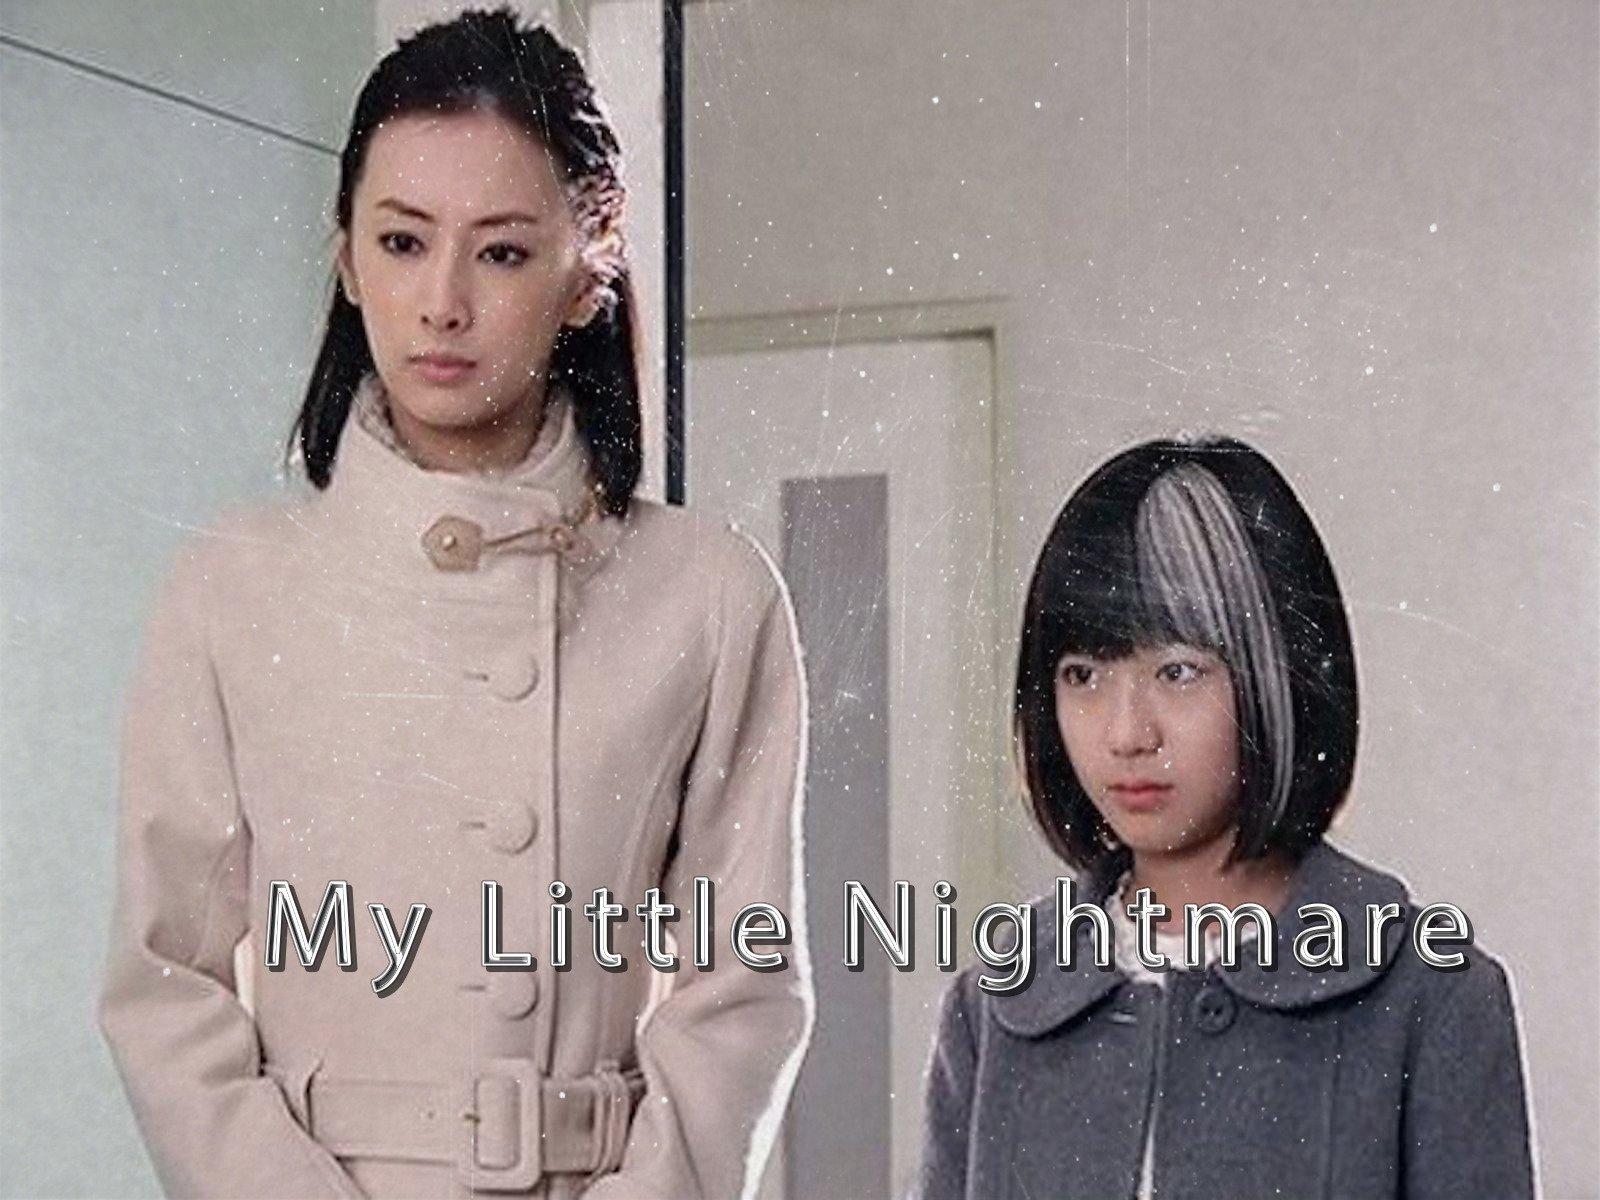 My Little Nightmare